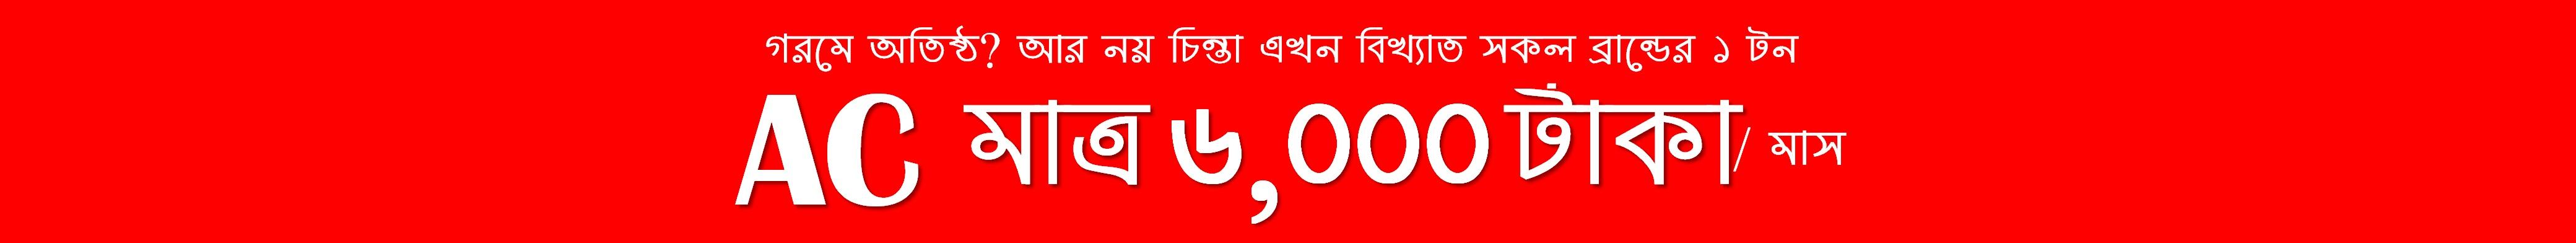 brandbazaarbd, brandbazaarbd air conditioner,  bangla air conditioner, bangladeshi air conditioner,